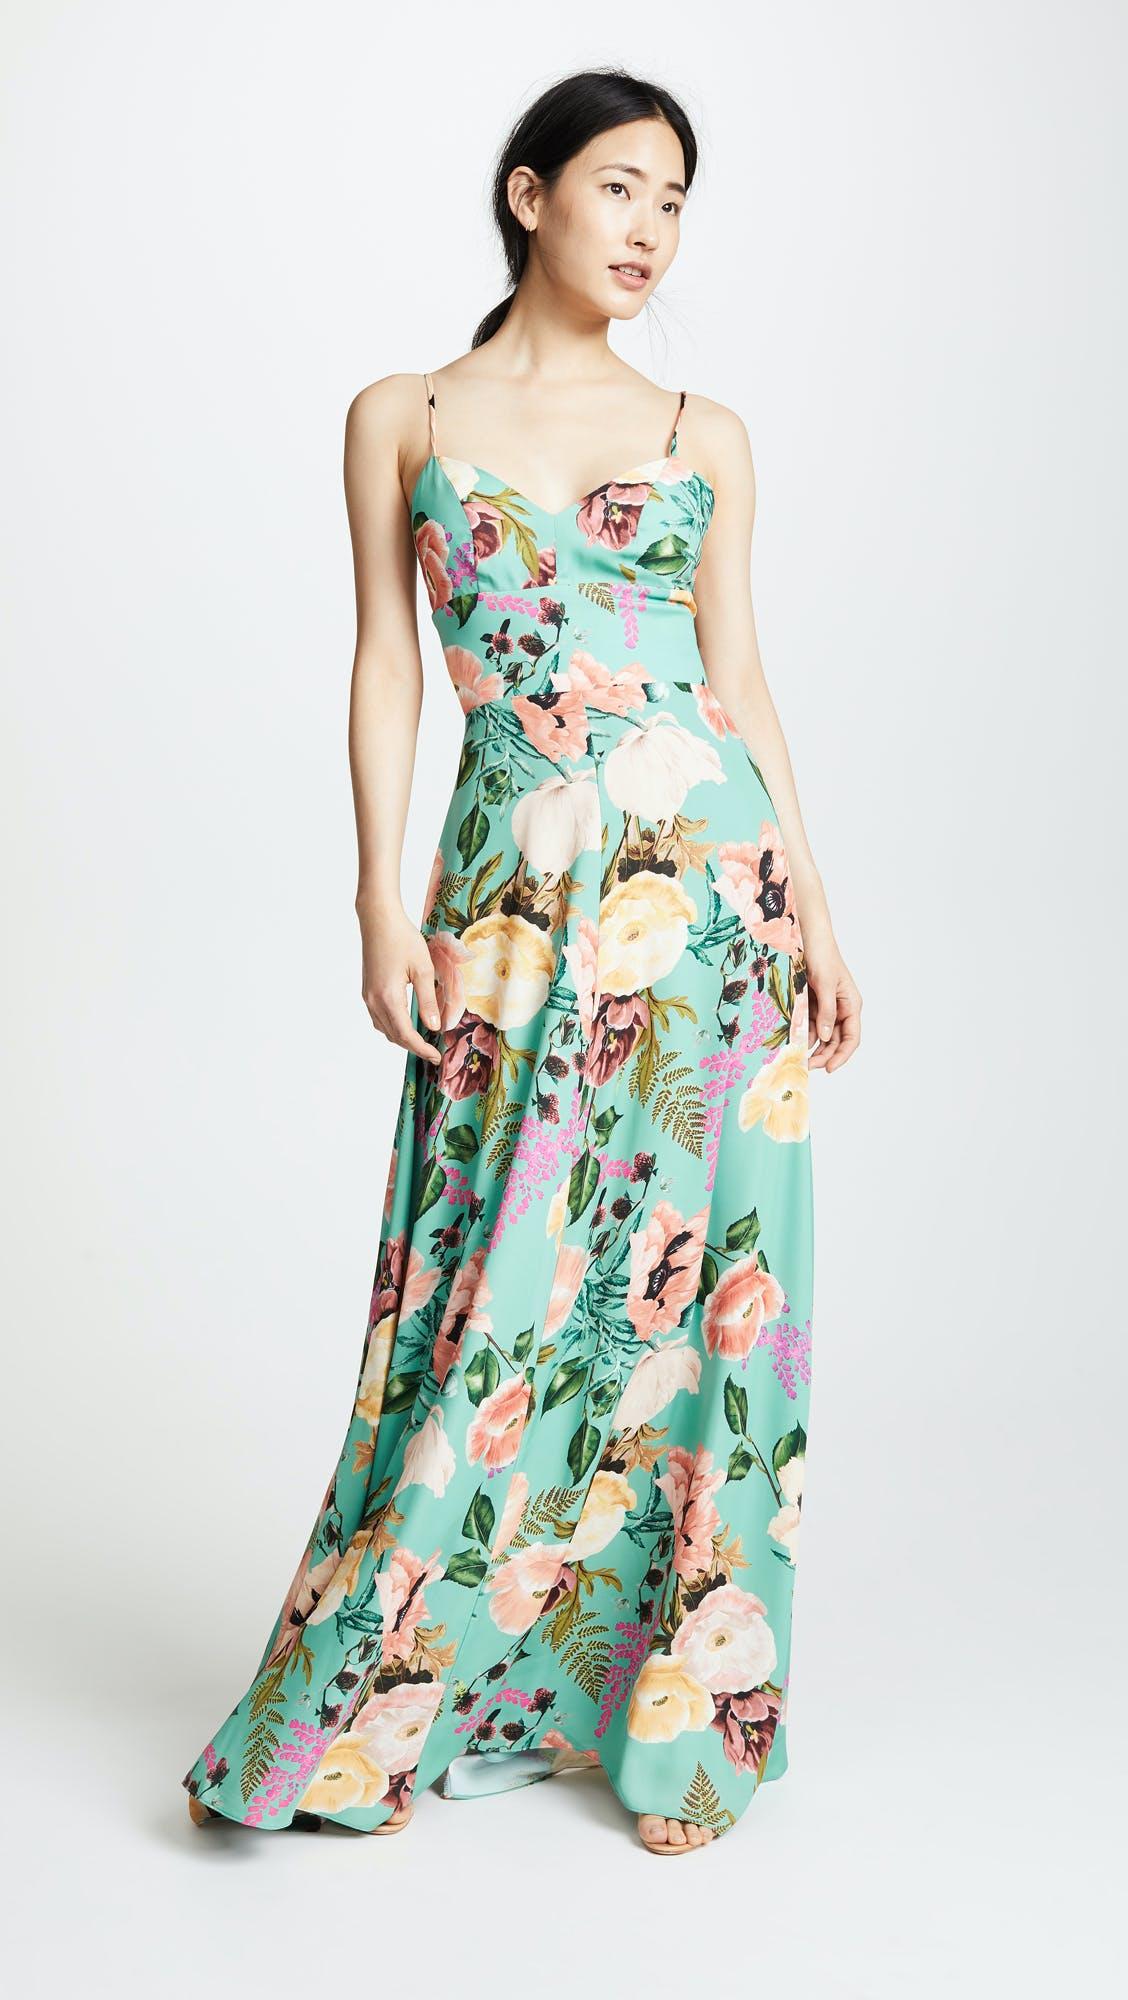 Sunrise Maxi Dress